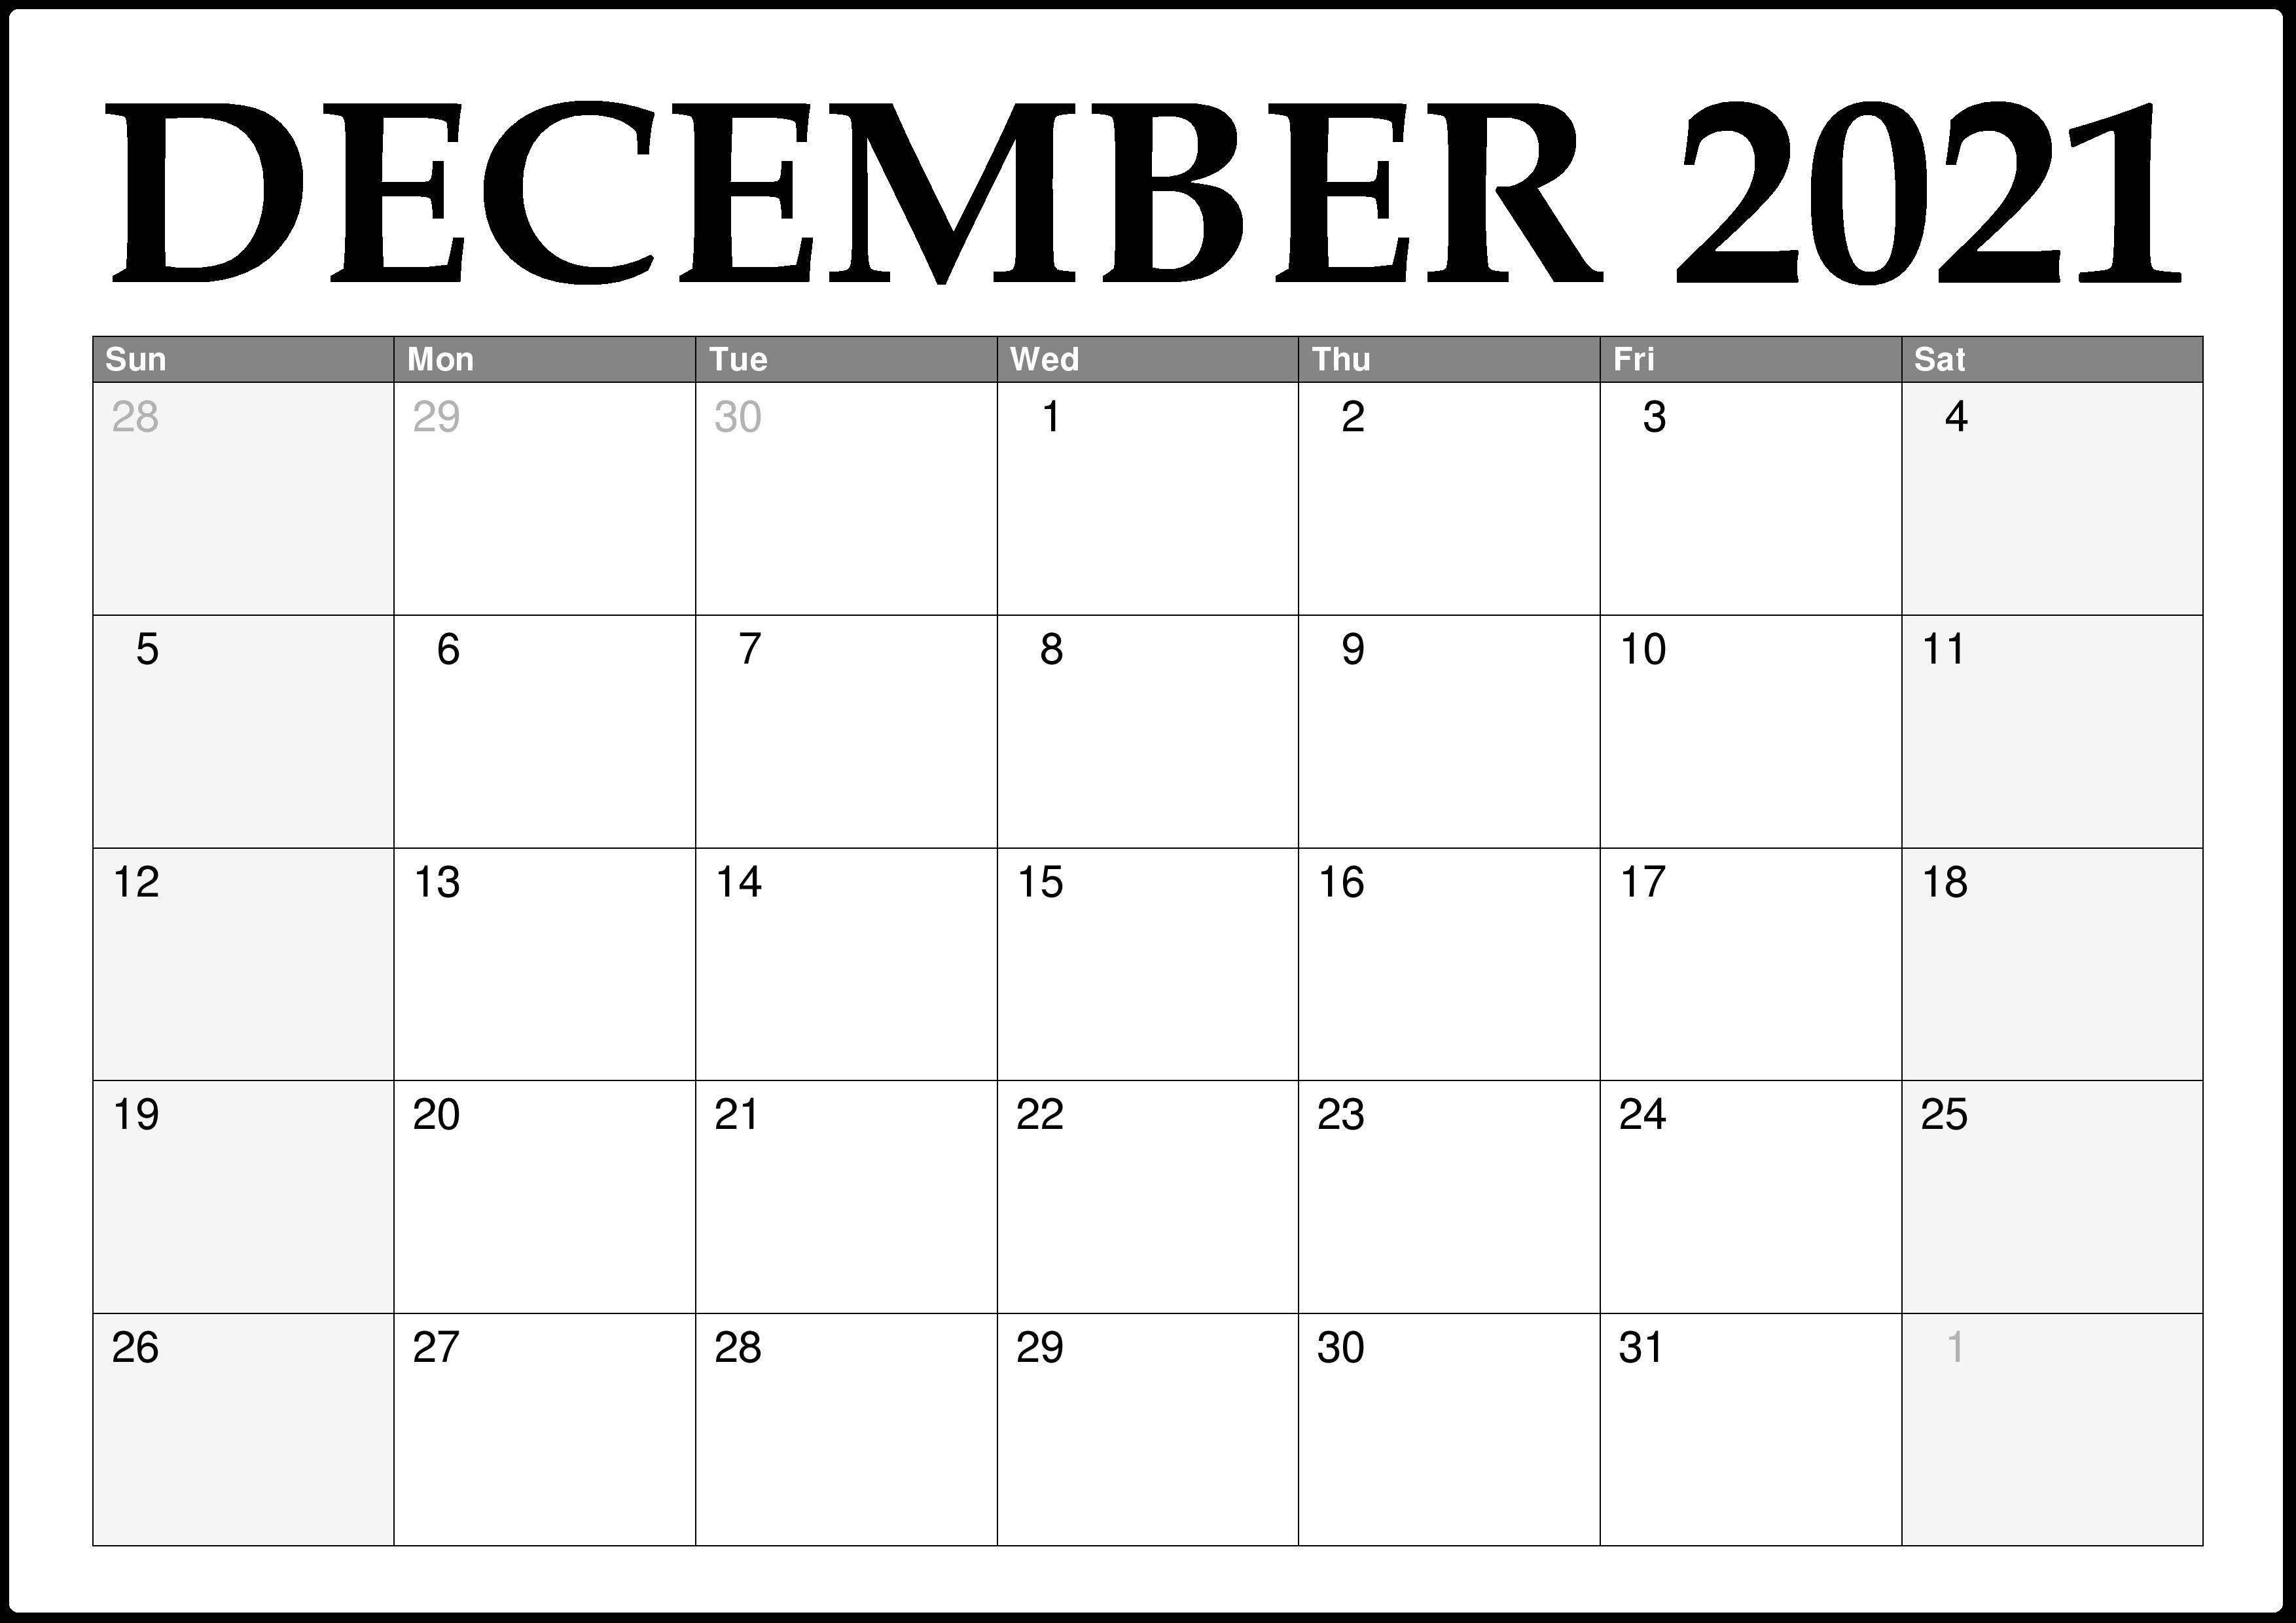 December 2021 Printable Calendar Grid Blank